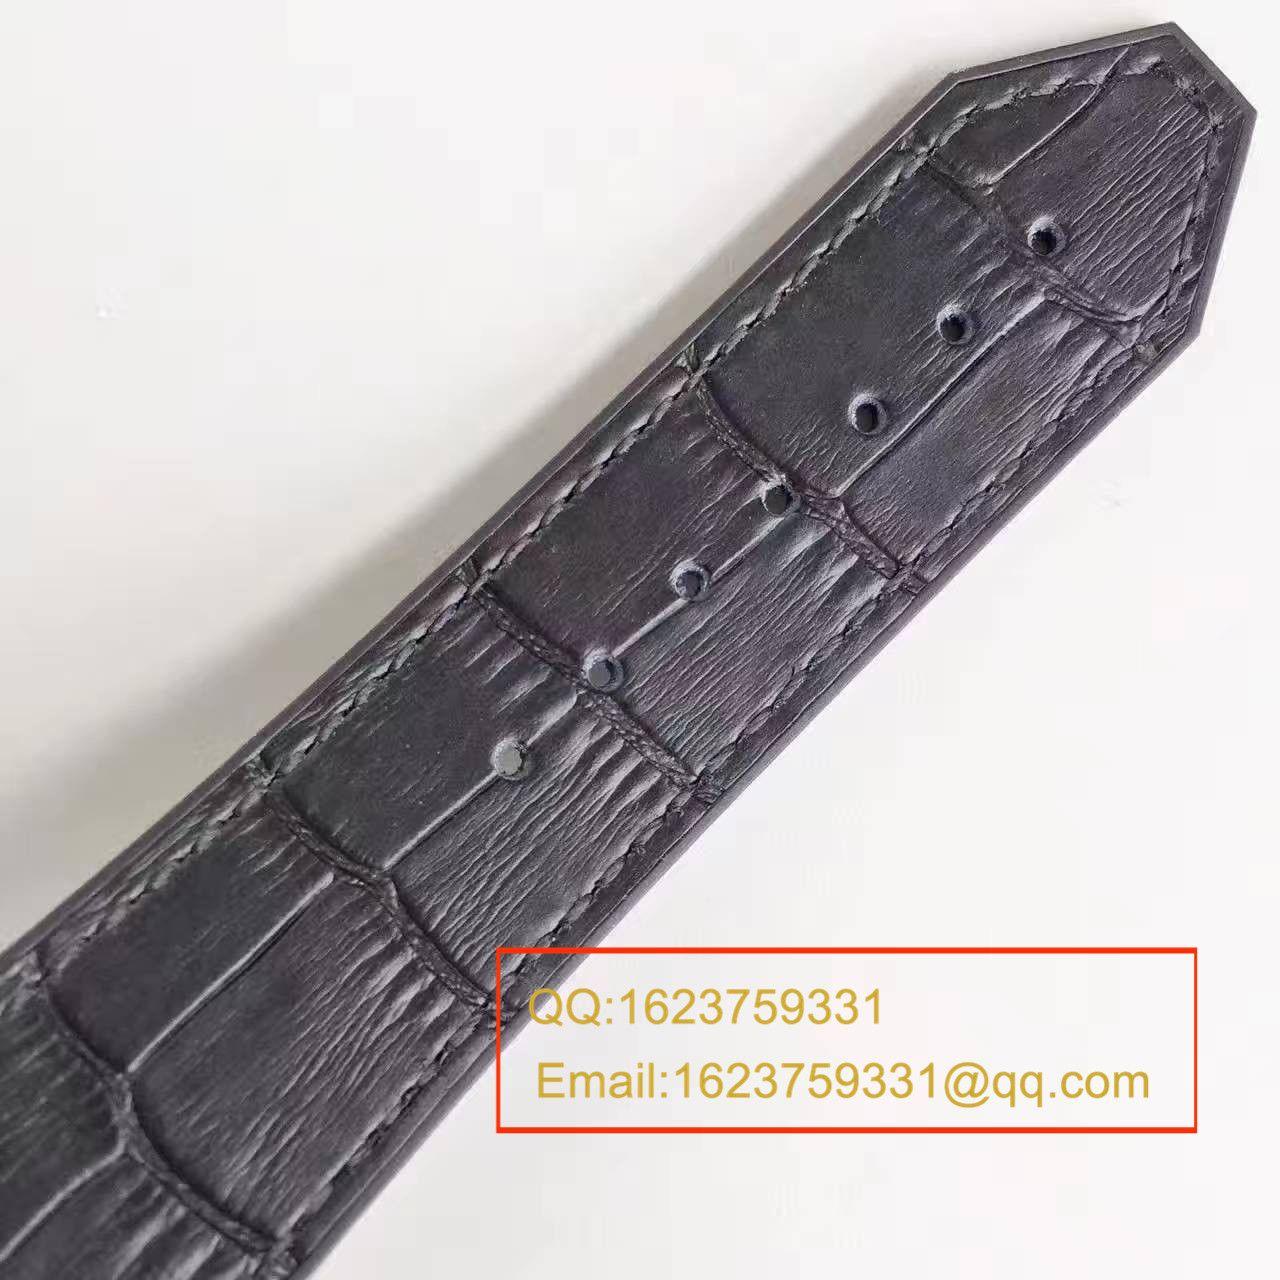 【JJ厂一比一超A高仿手表】宇舶经典融合系列511.OX.2610.LR腕表 / YBBE049